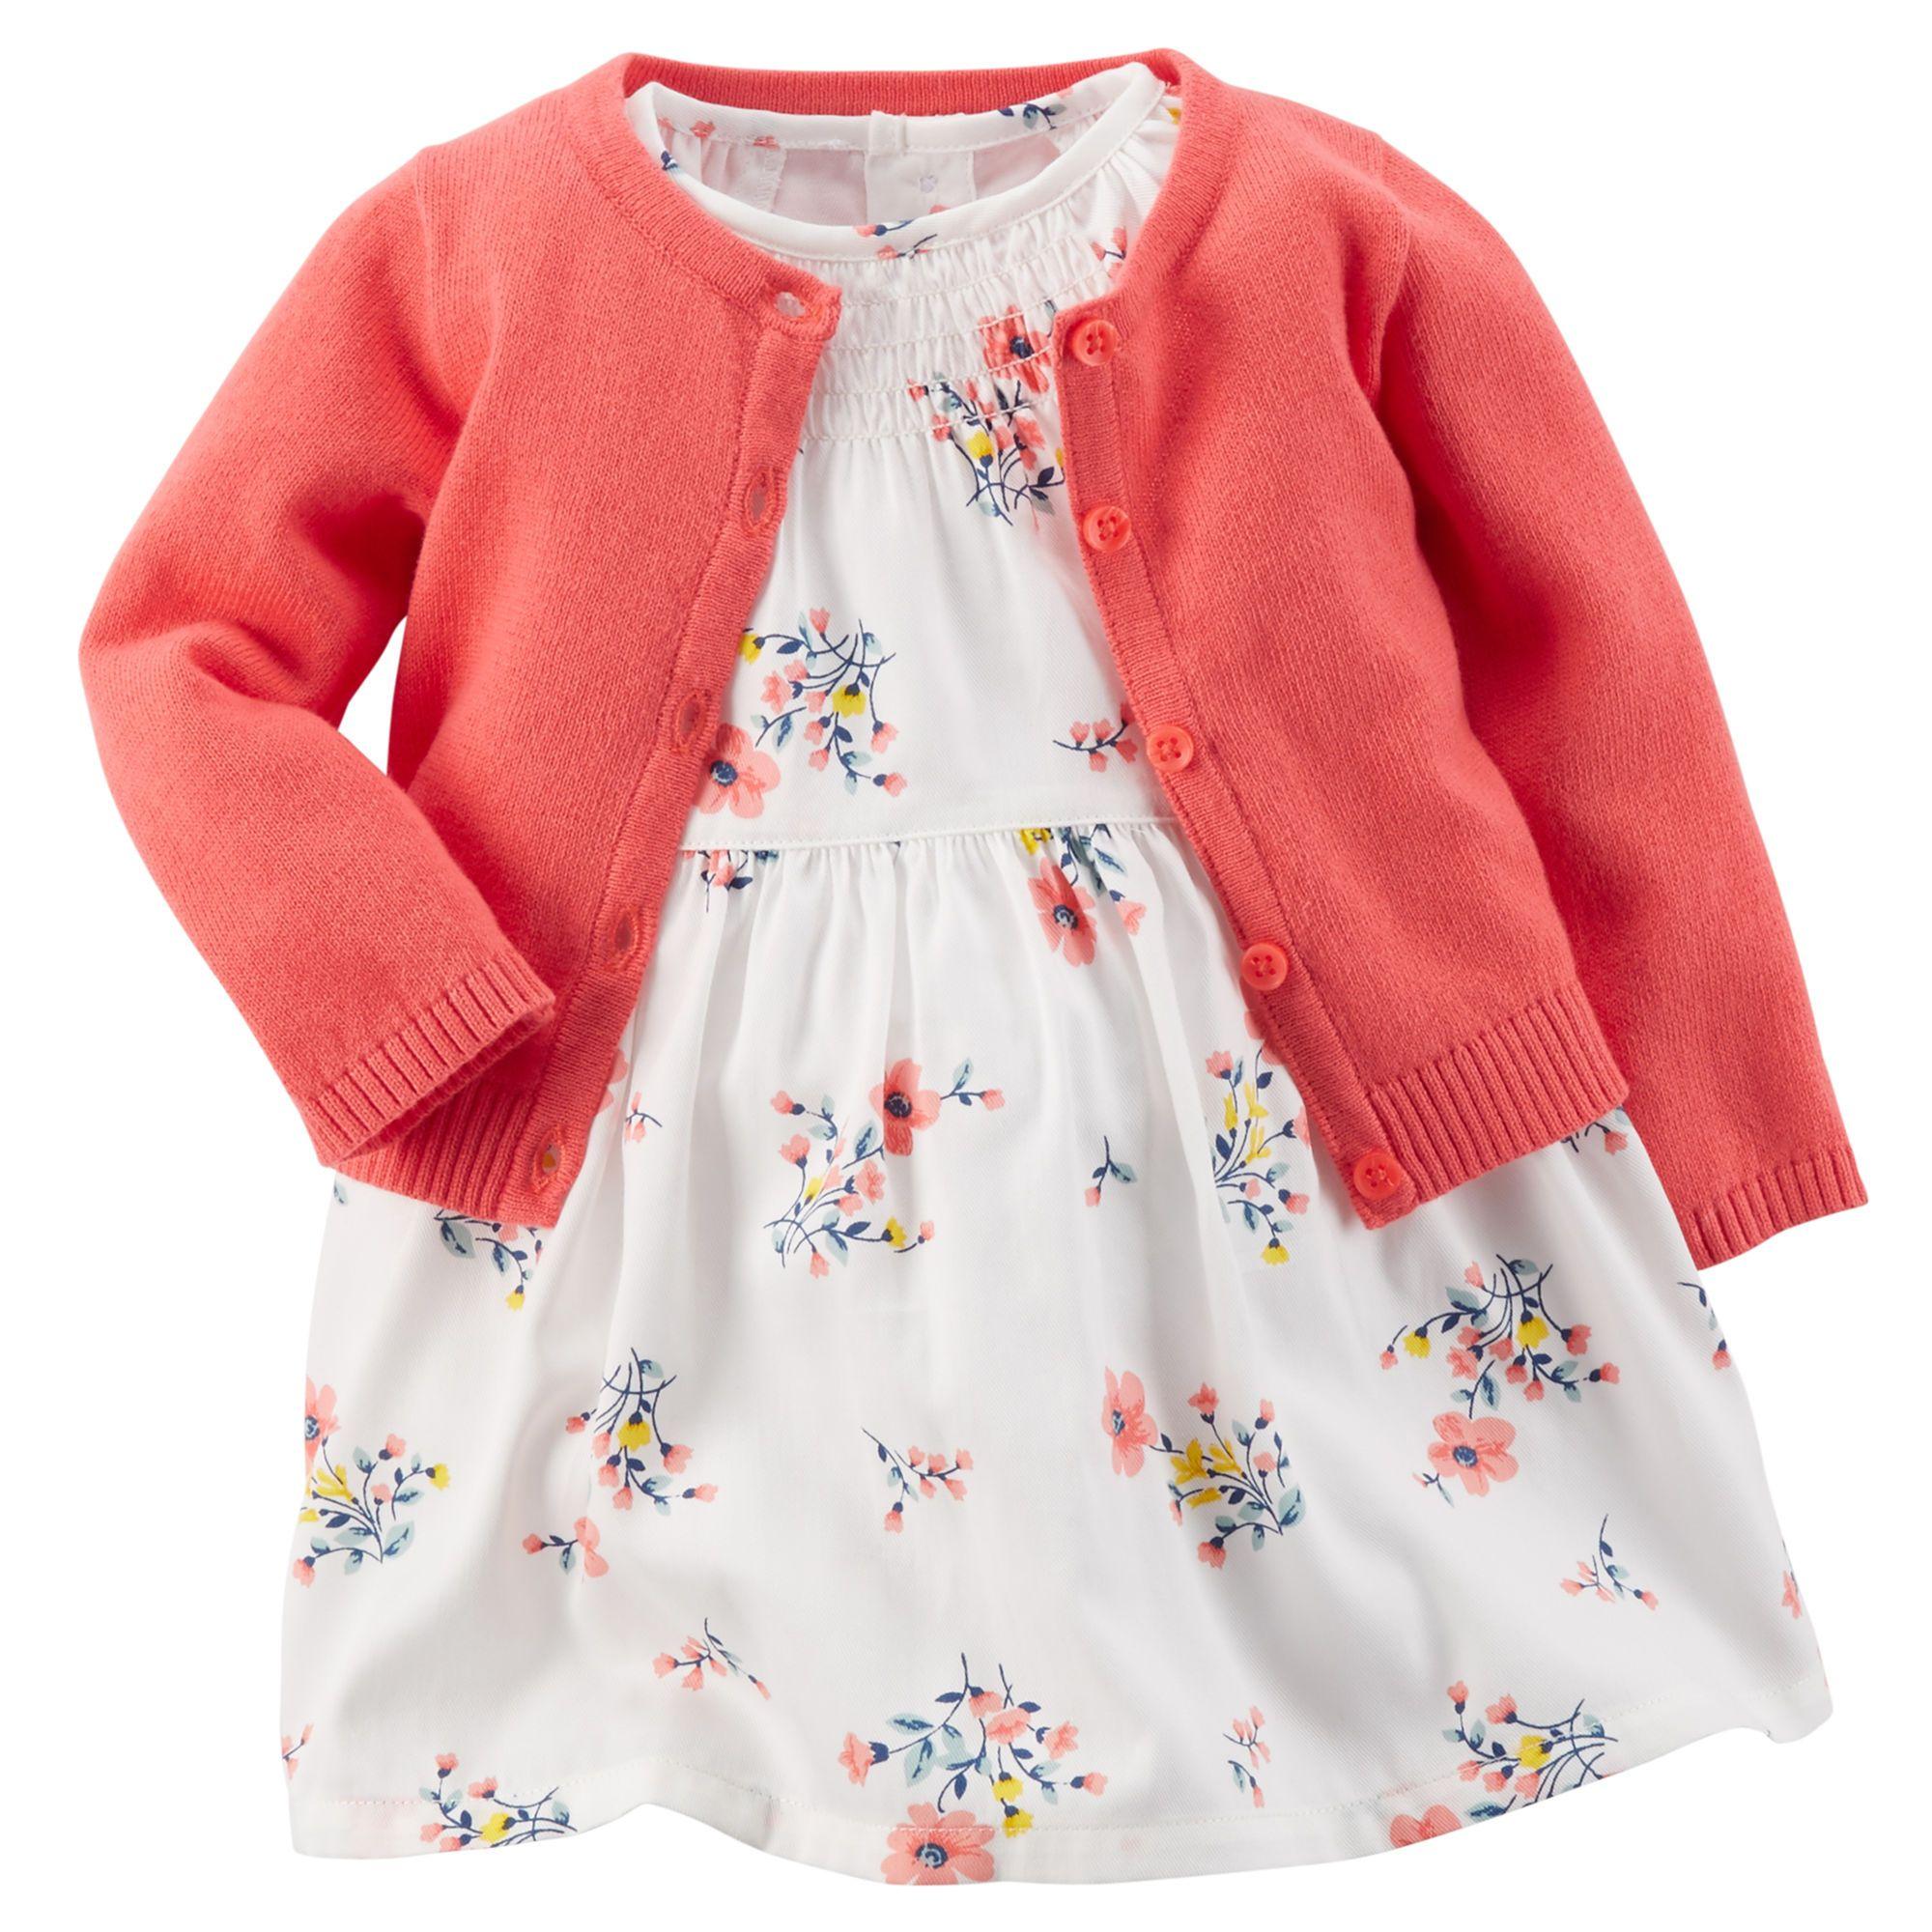 Baby Girl 2 Piece Smocked Dress & Sweater Set Carters